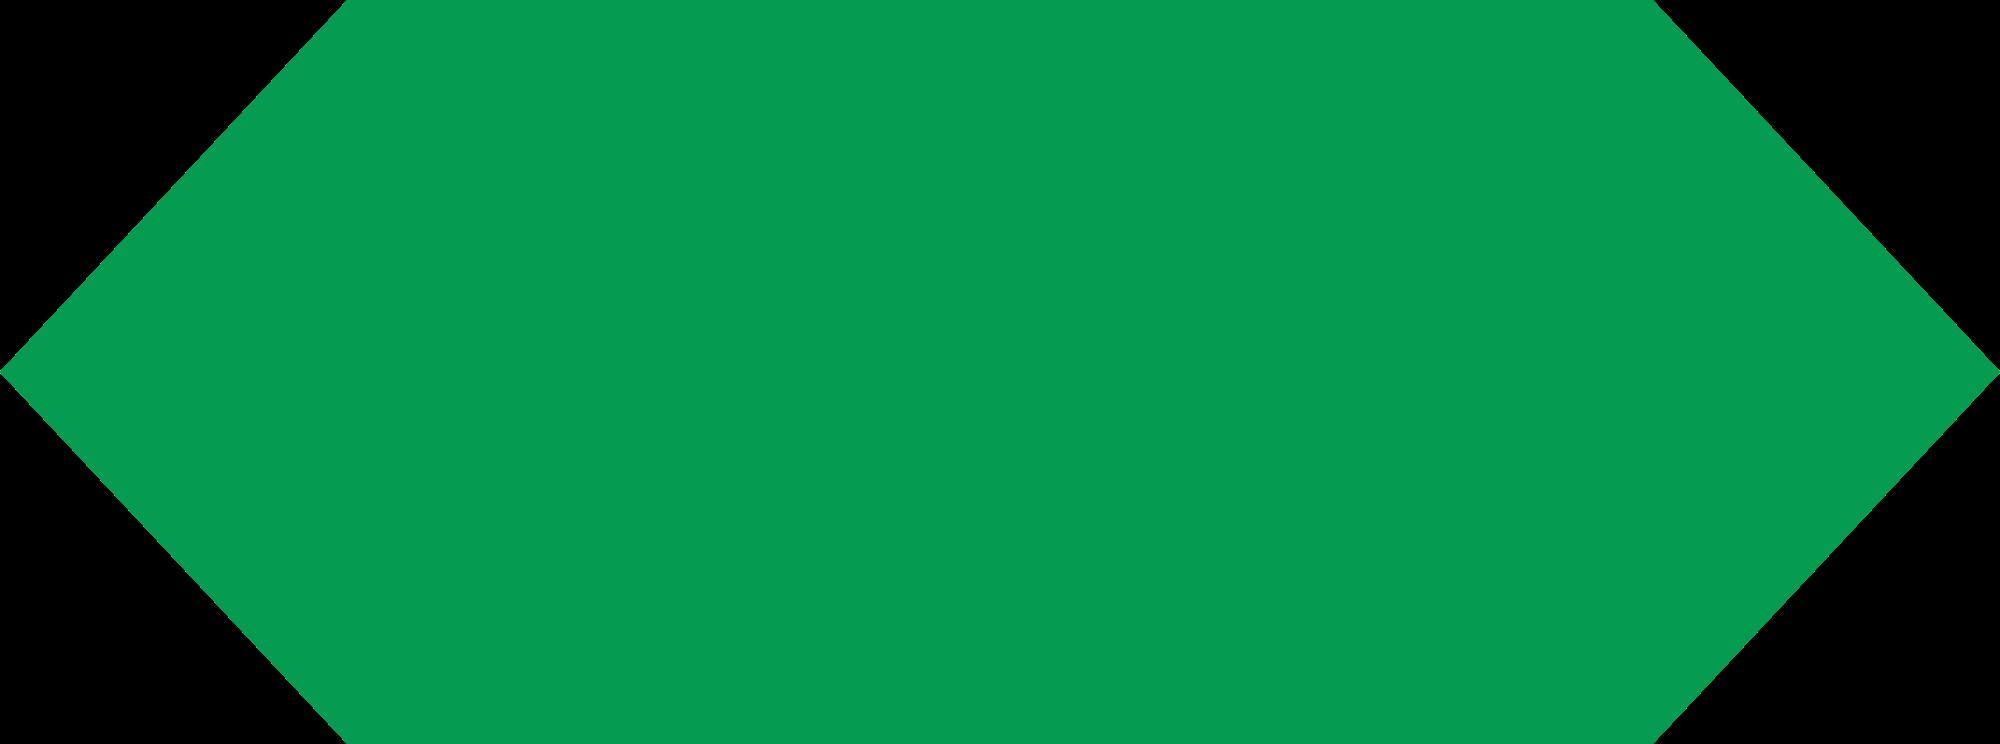 File:Hamburg Bus-Logo Eilbus Blank.svg - Wikimedia Commons